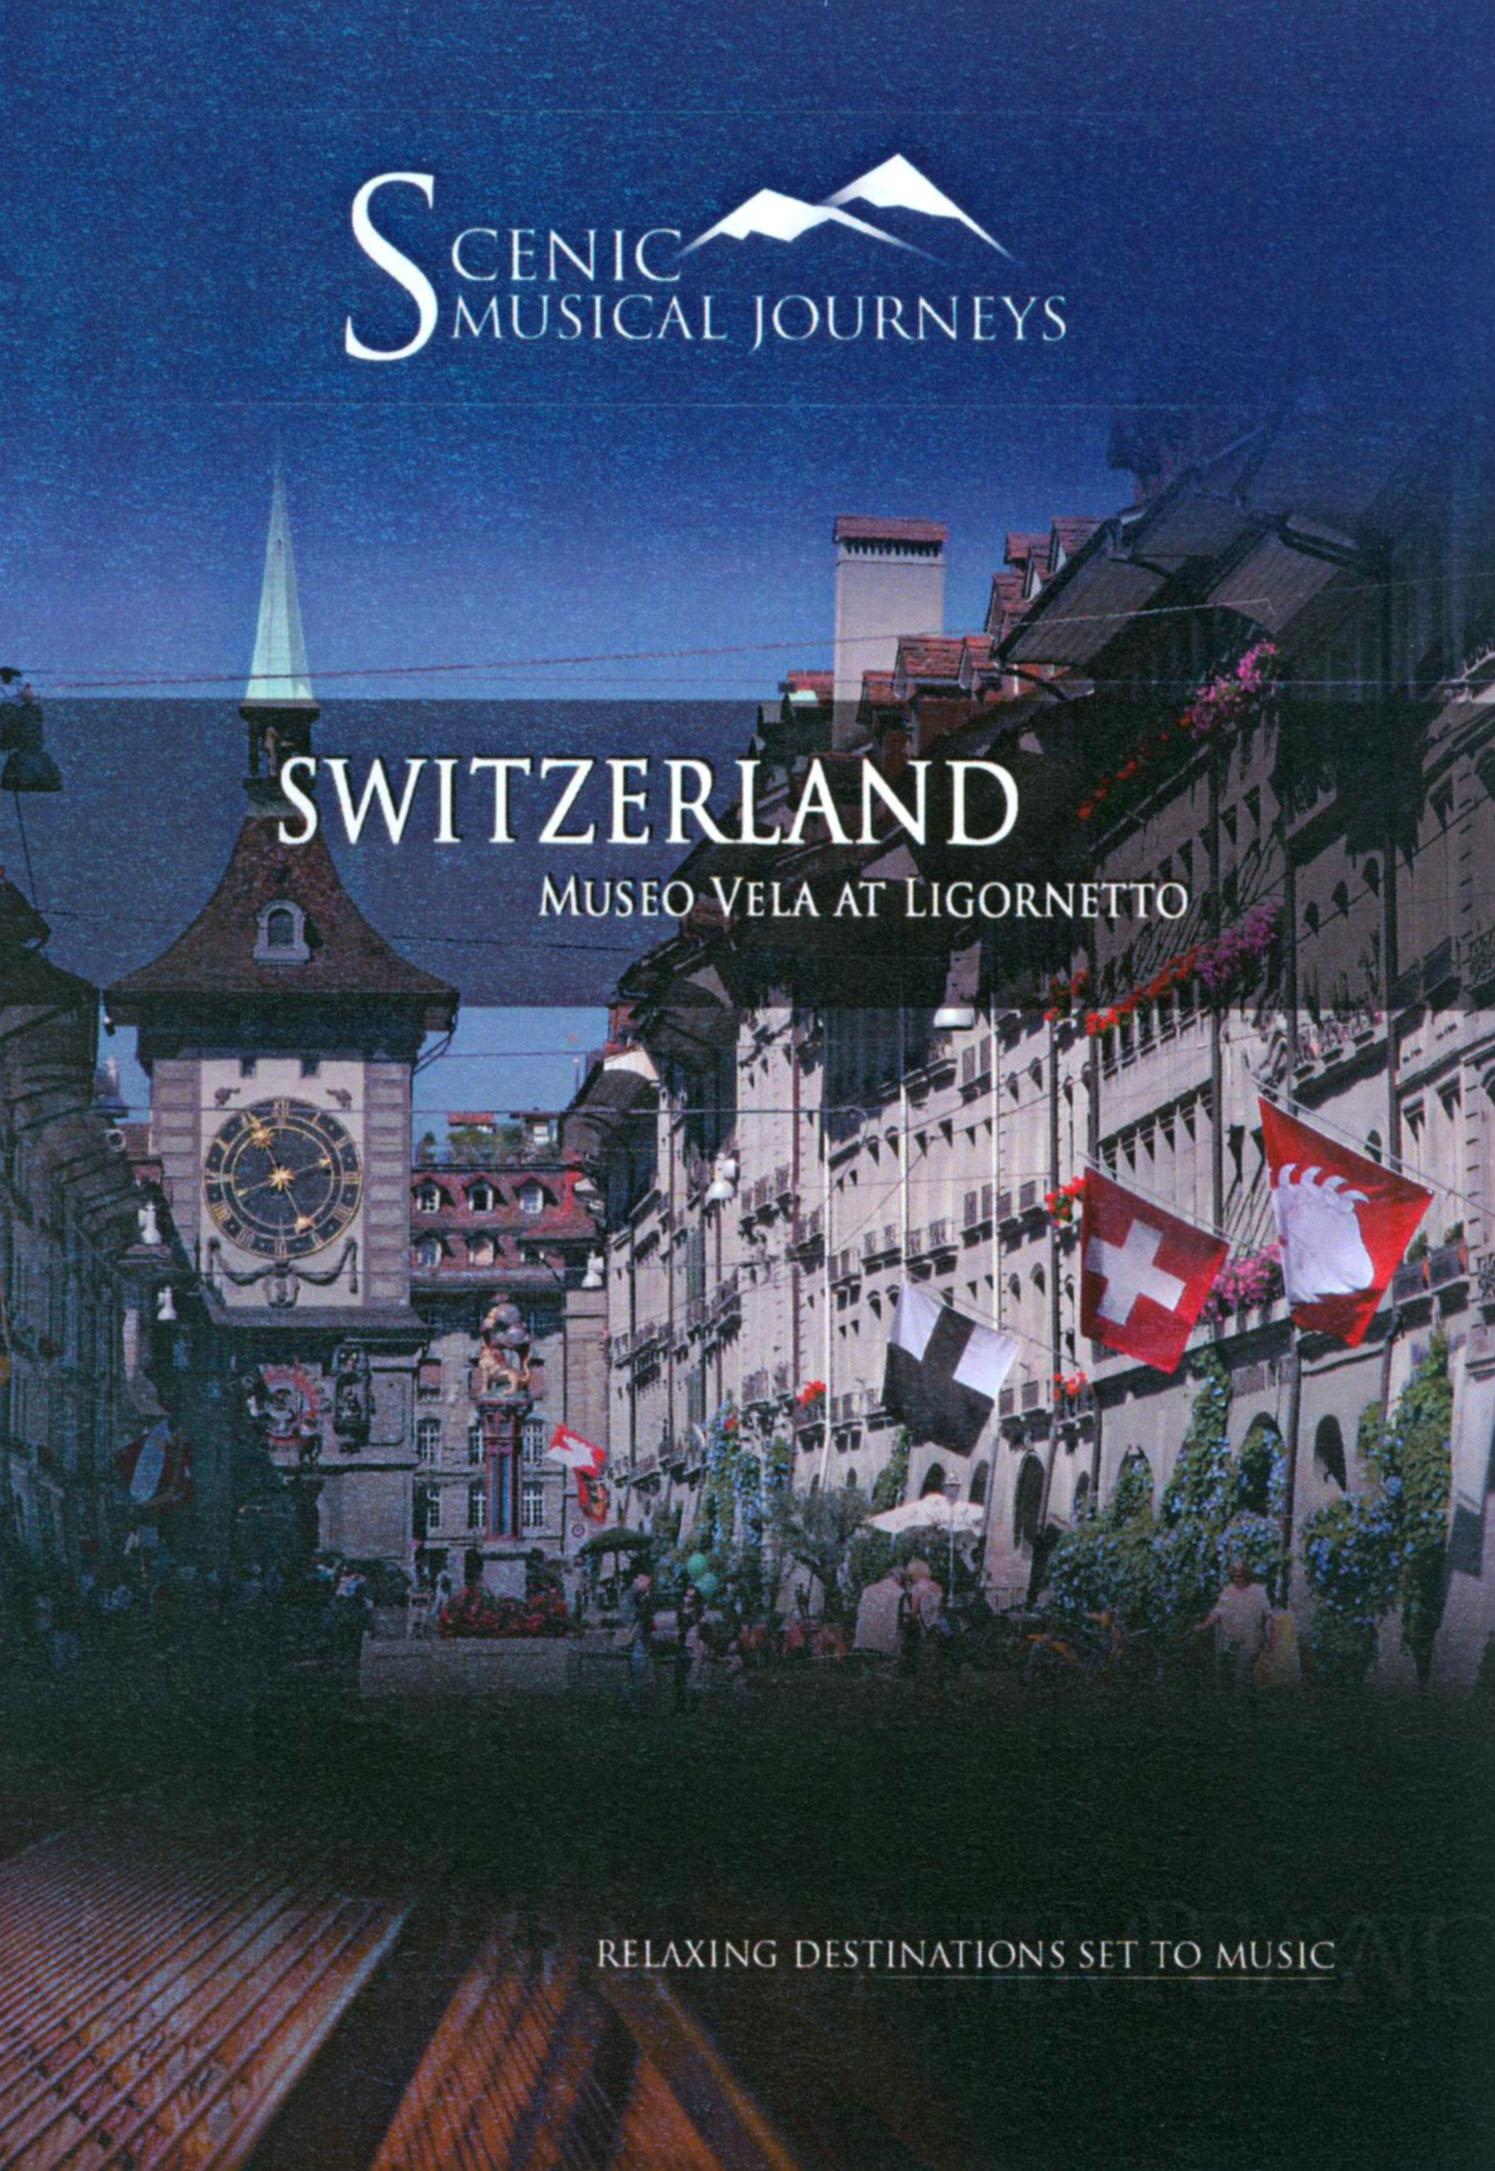 Scenic Musical Journeys: Switzerland - Museo Vela at Ligornetto